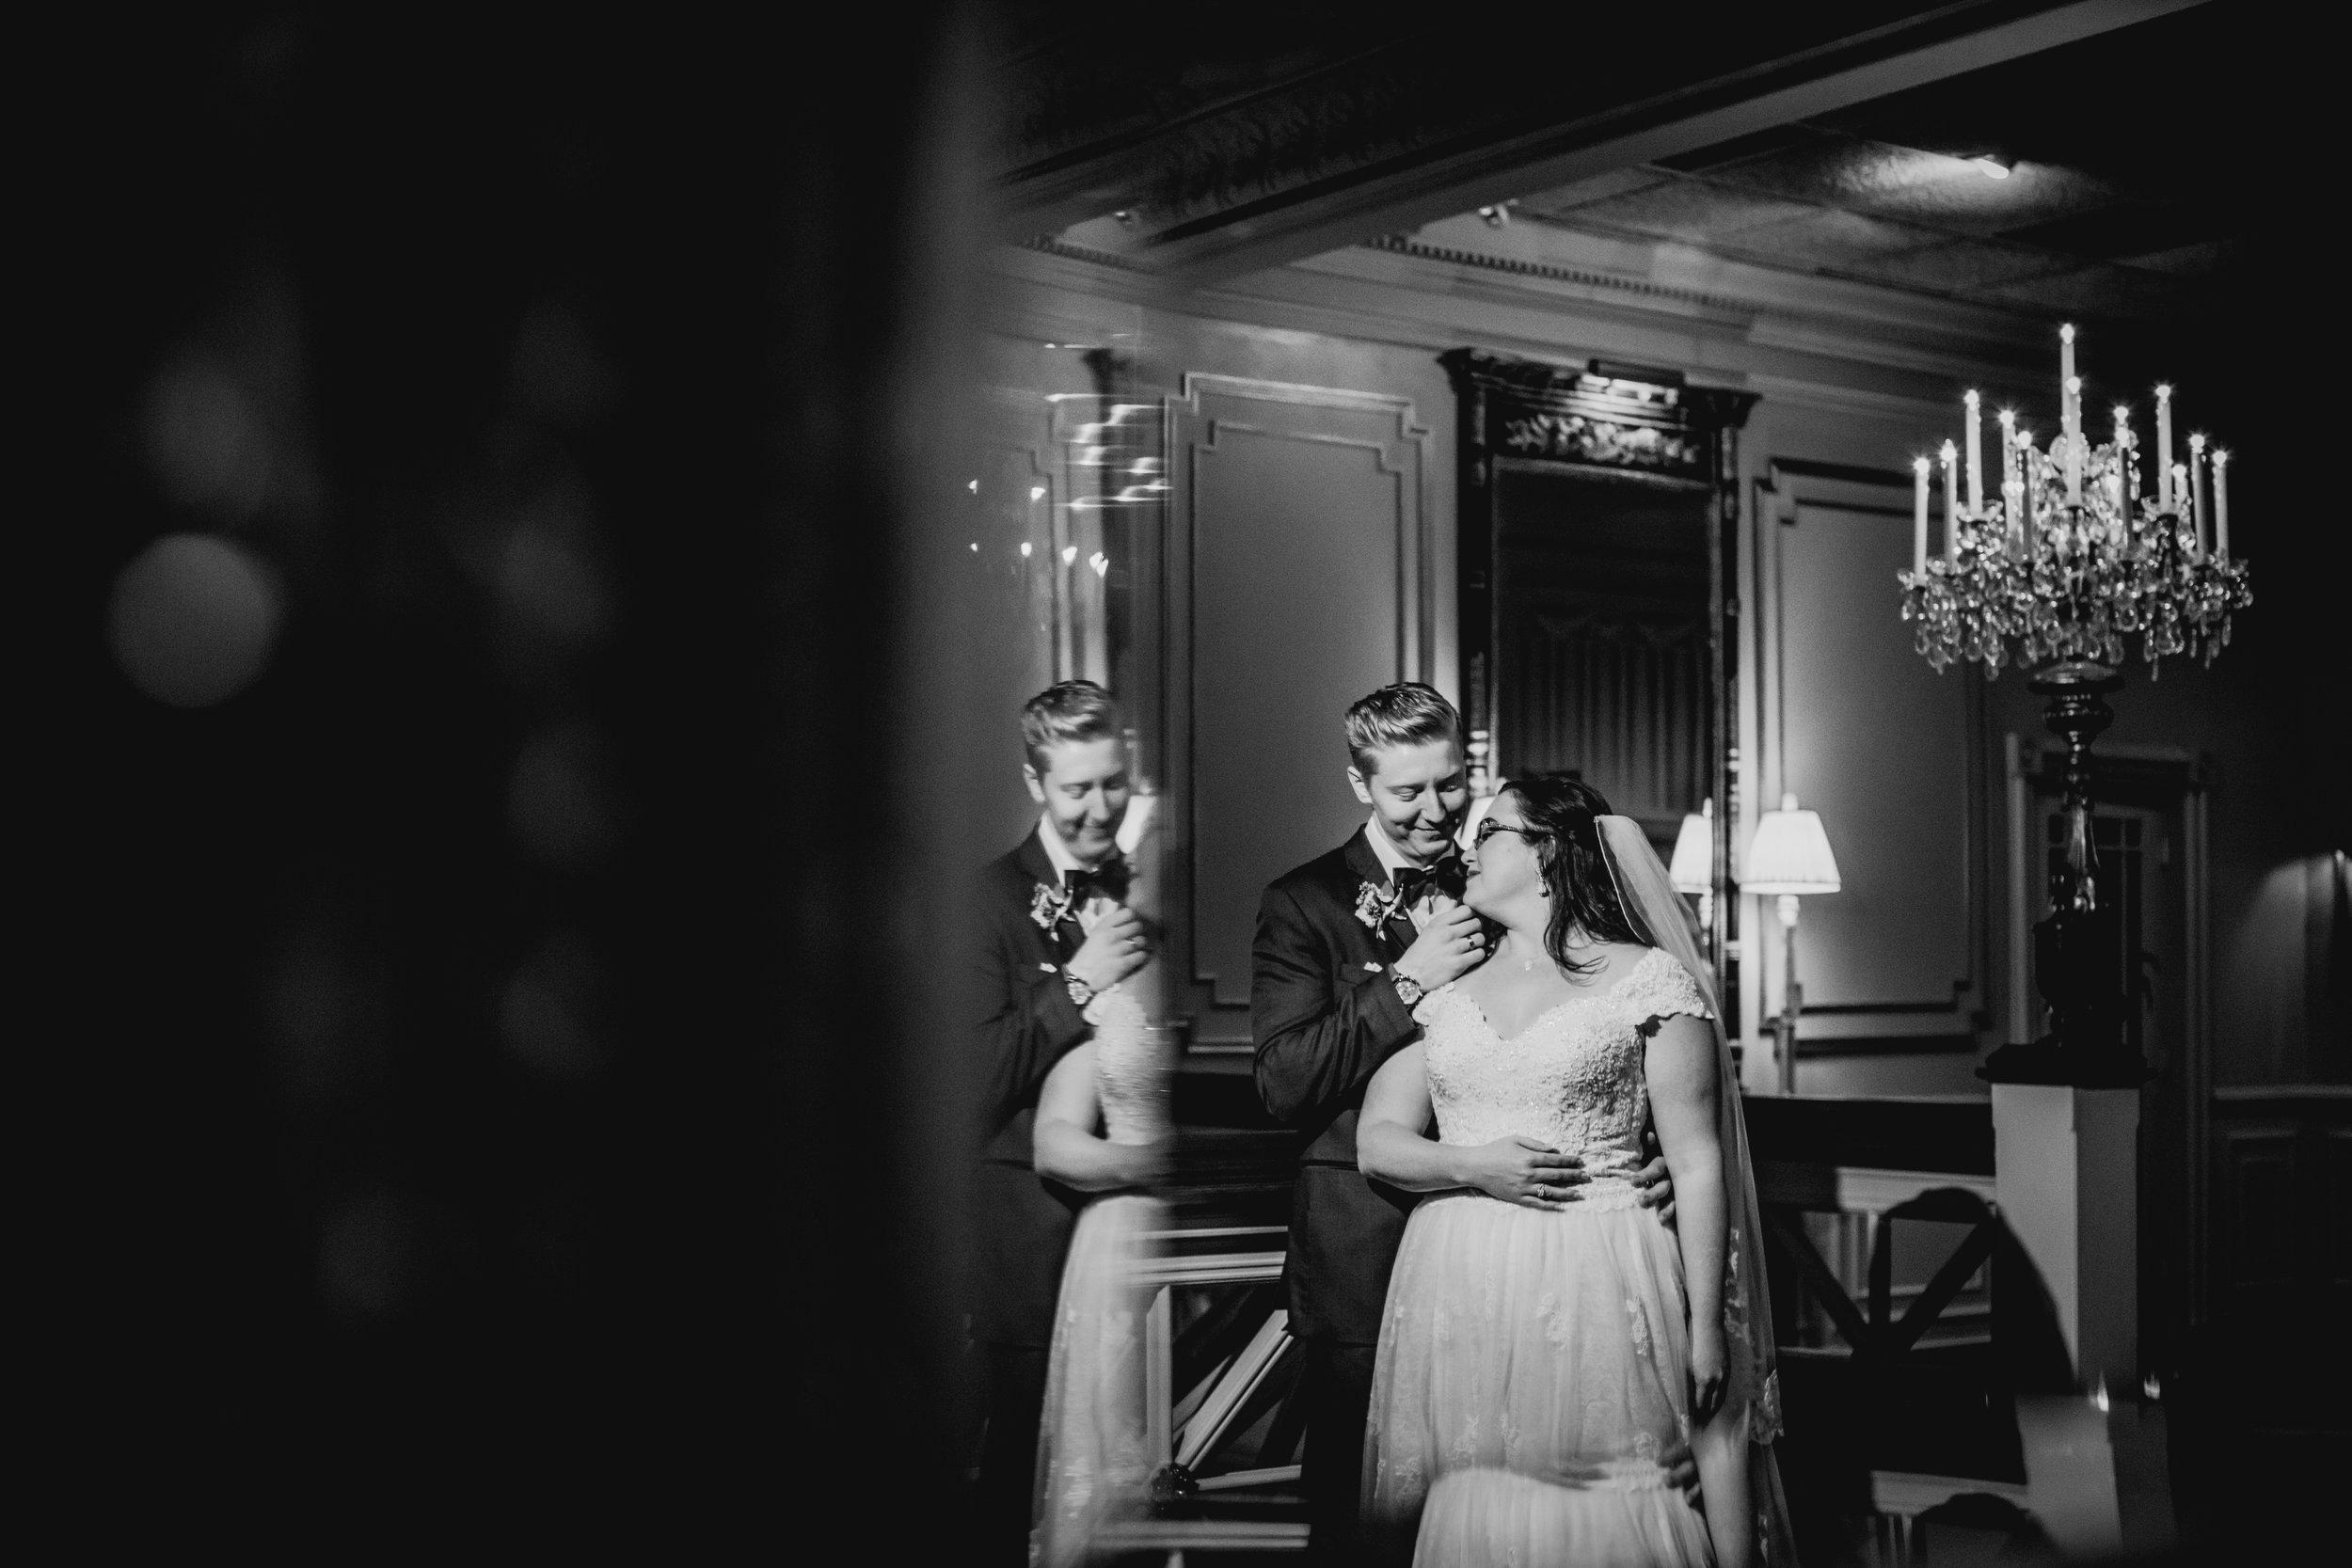 New-Jersey-Wedding-Photography-Fishers-Tudor-House-JennaLynnPhotography-Bride&GroomBW-Kathleen&Eddie-22.jpg